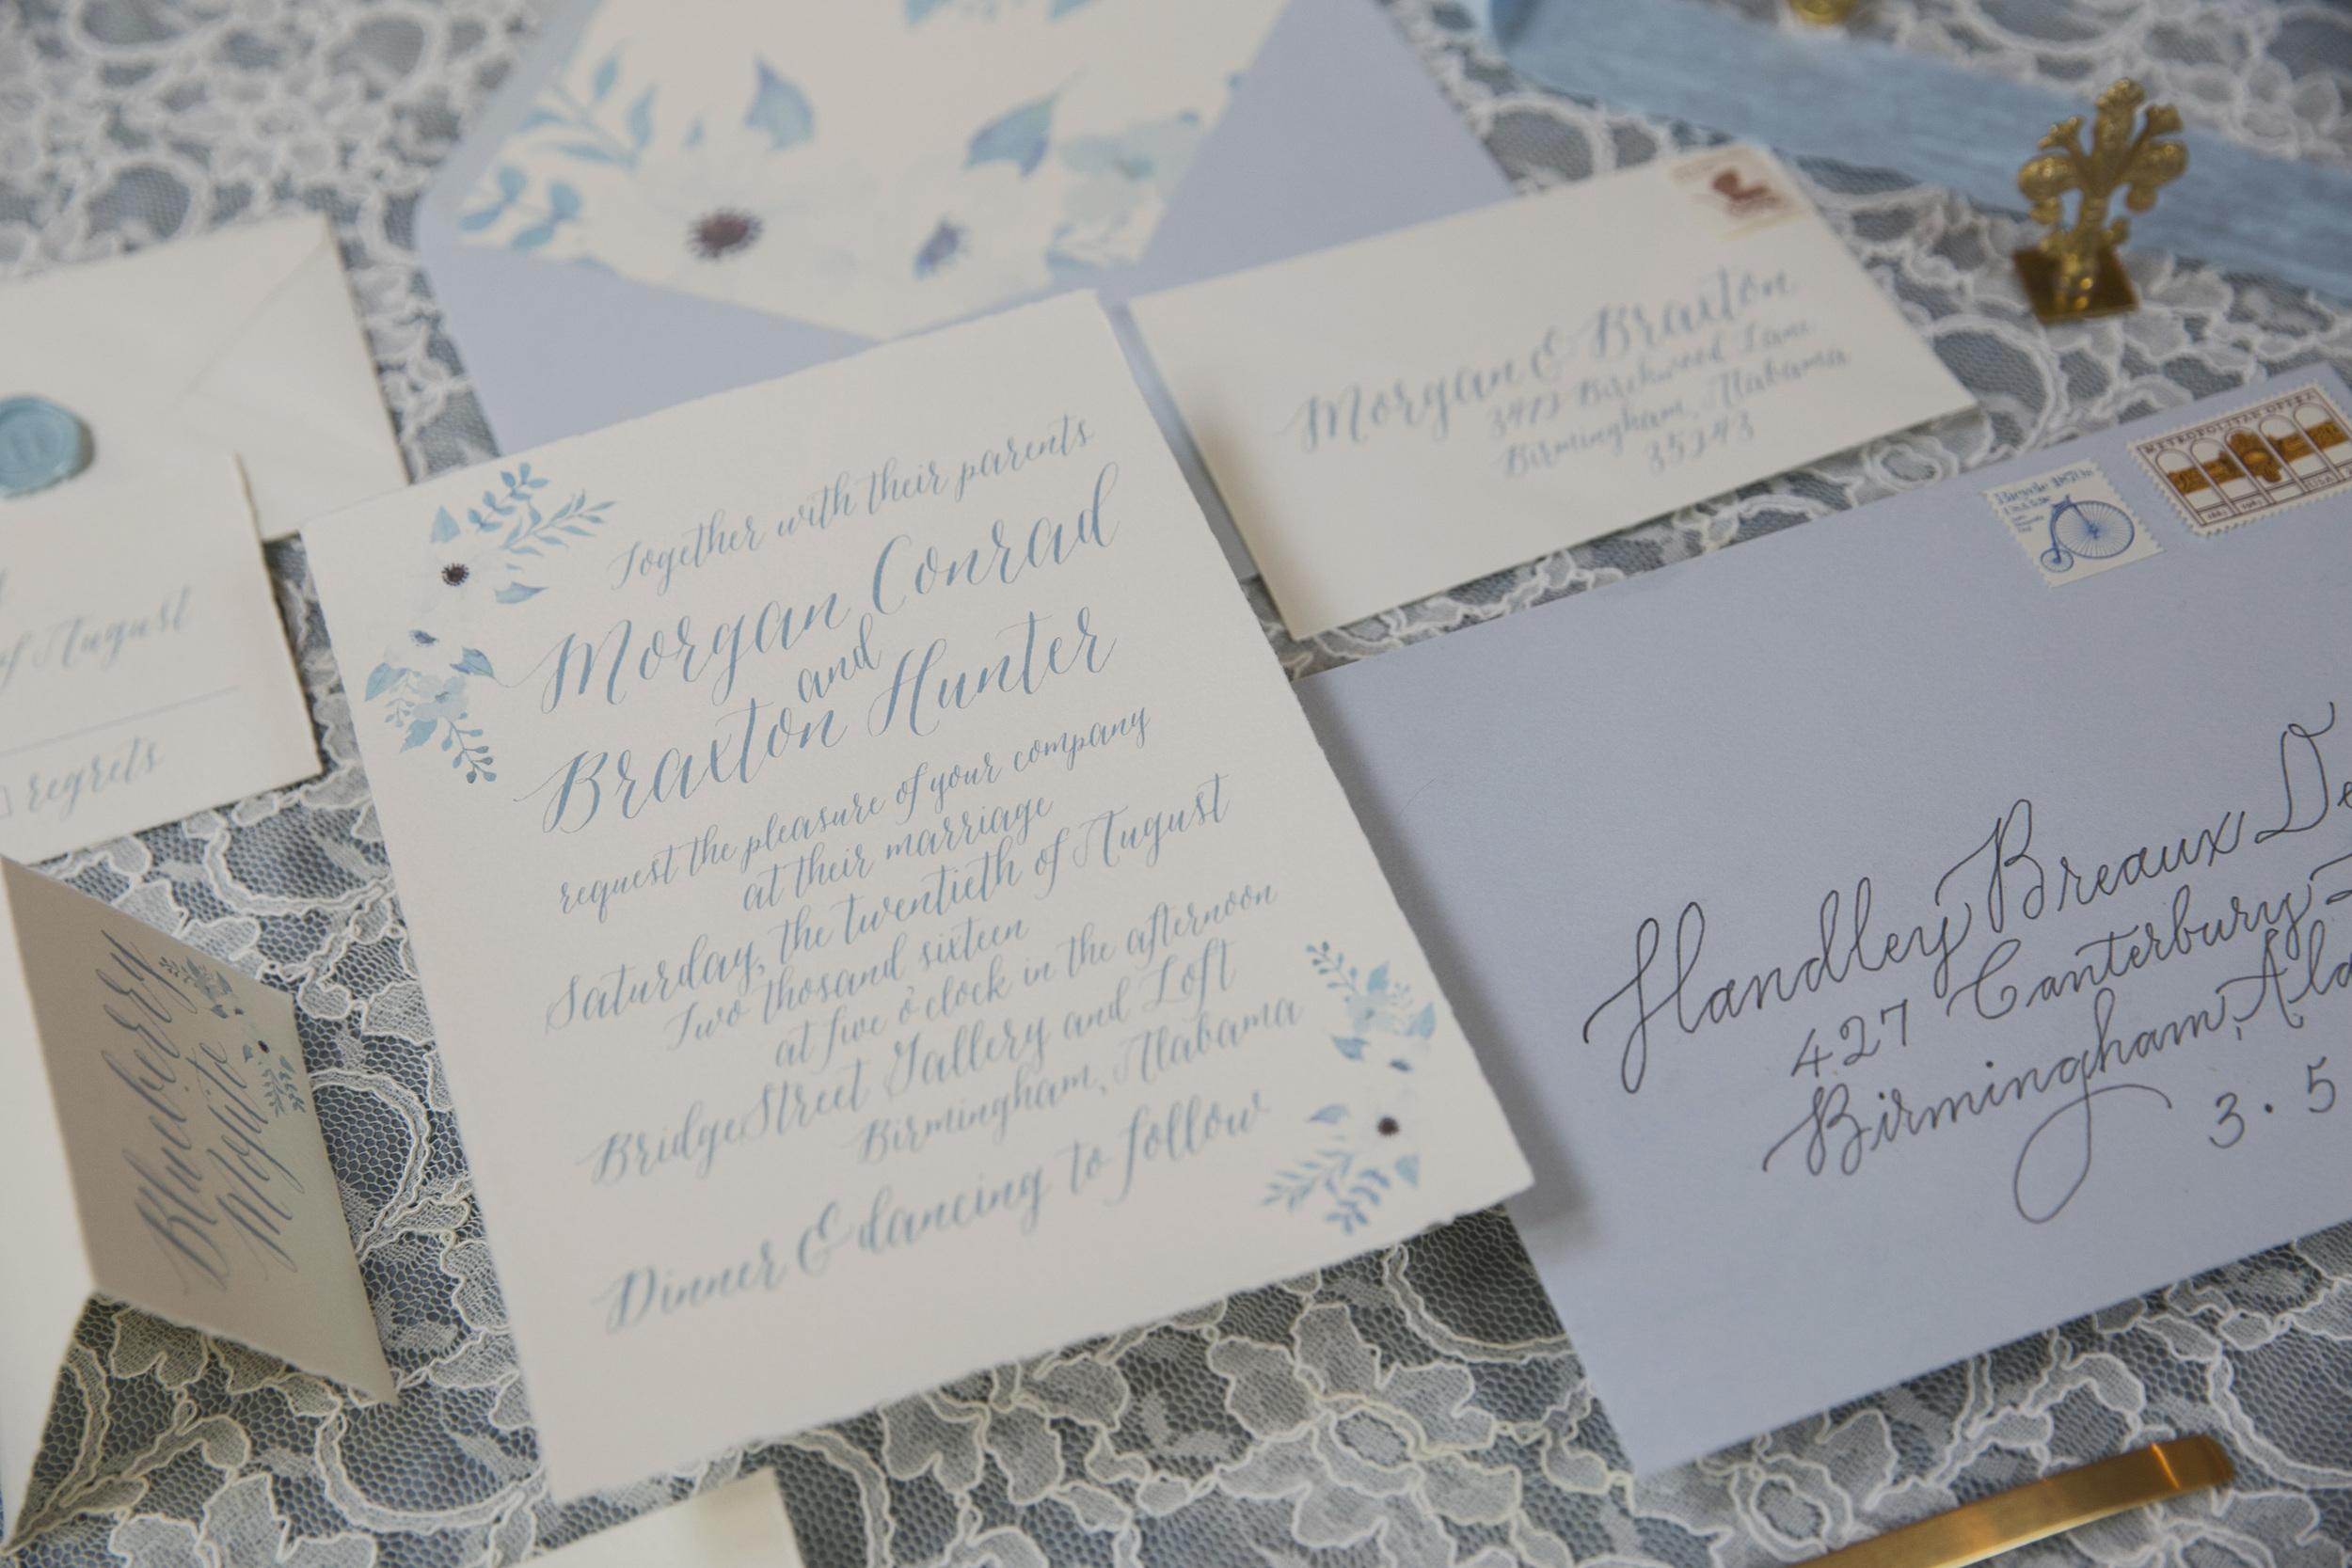 Handley McCrory _ Handley Breaux Designs